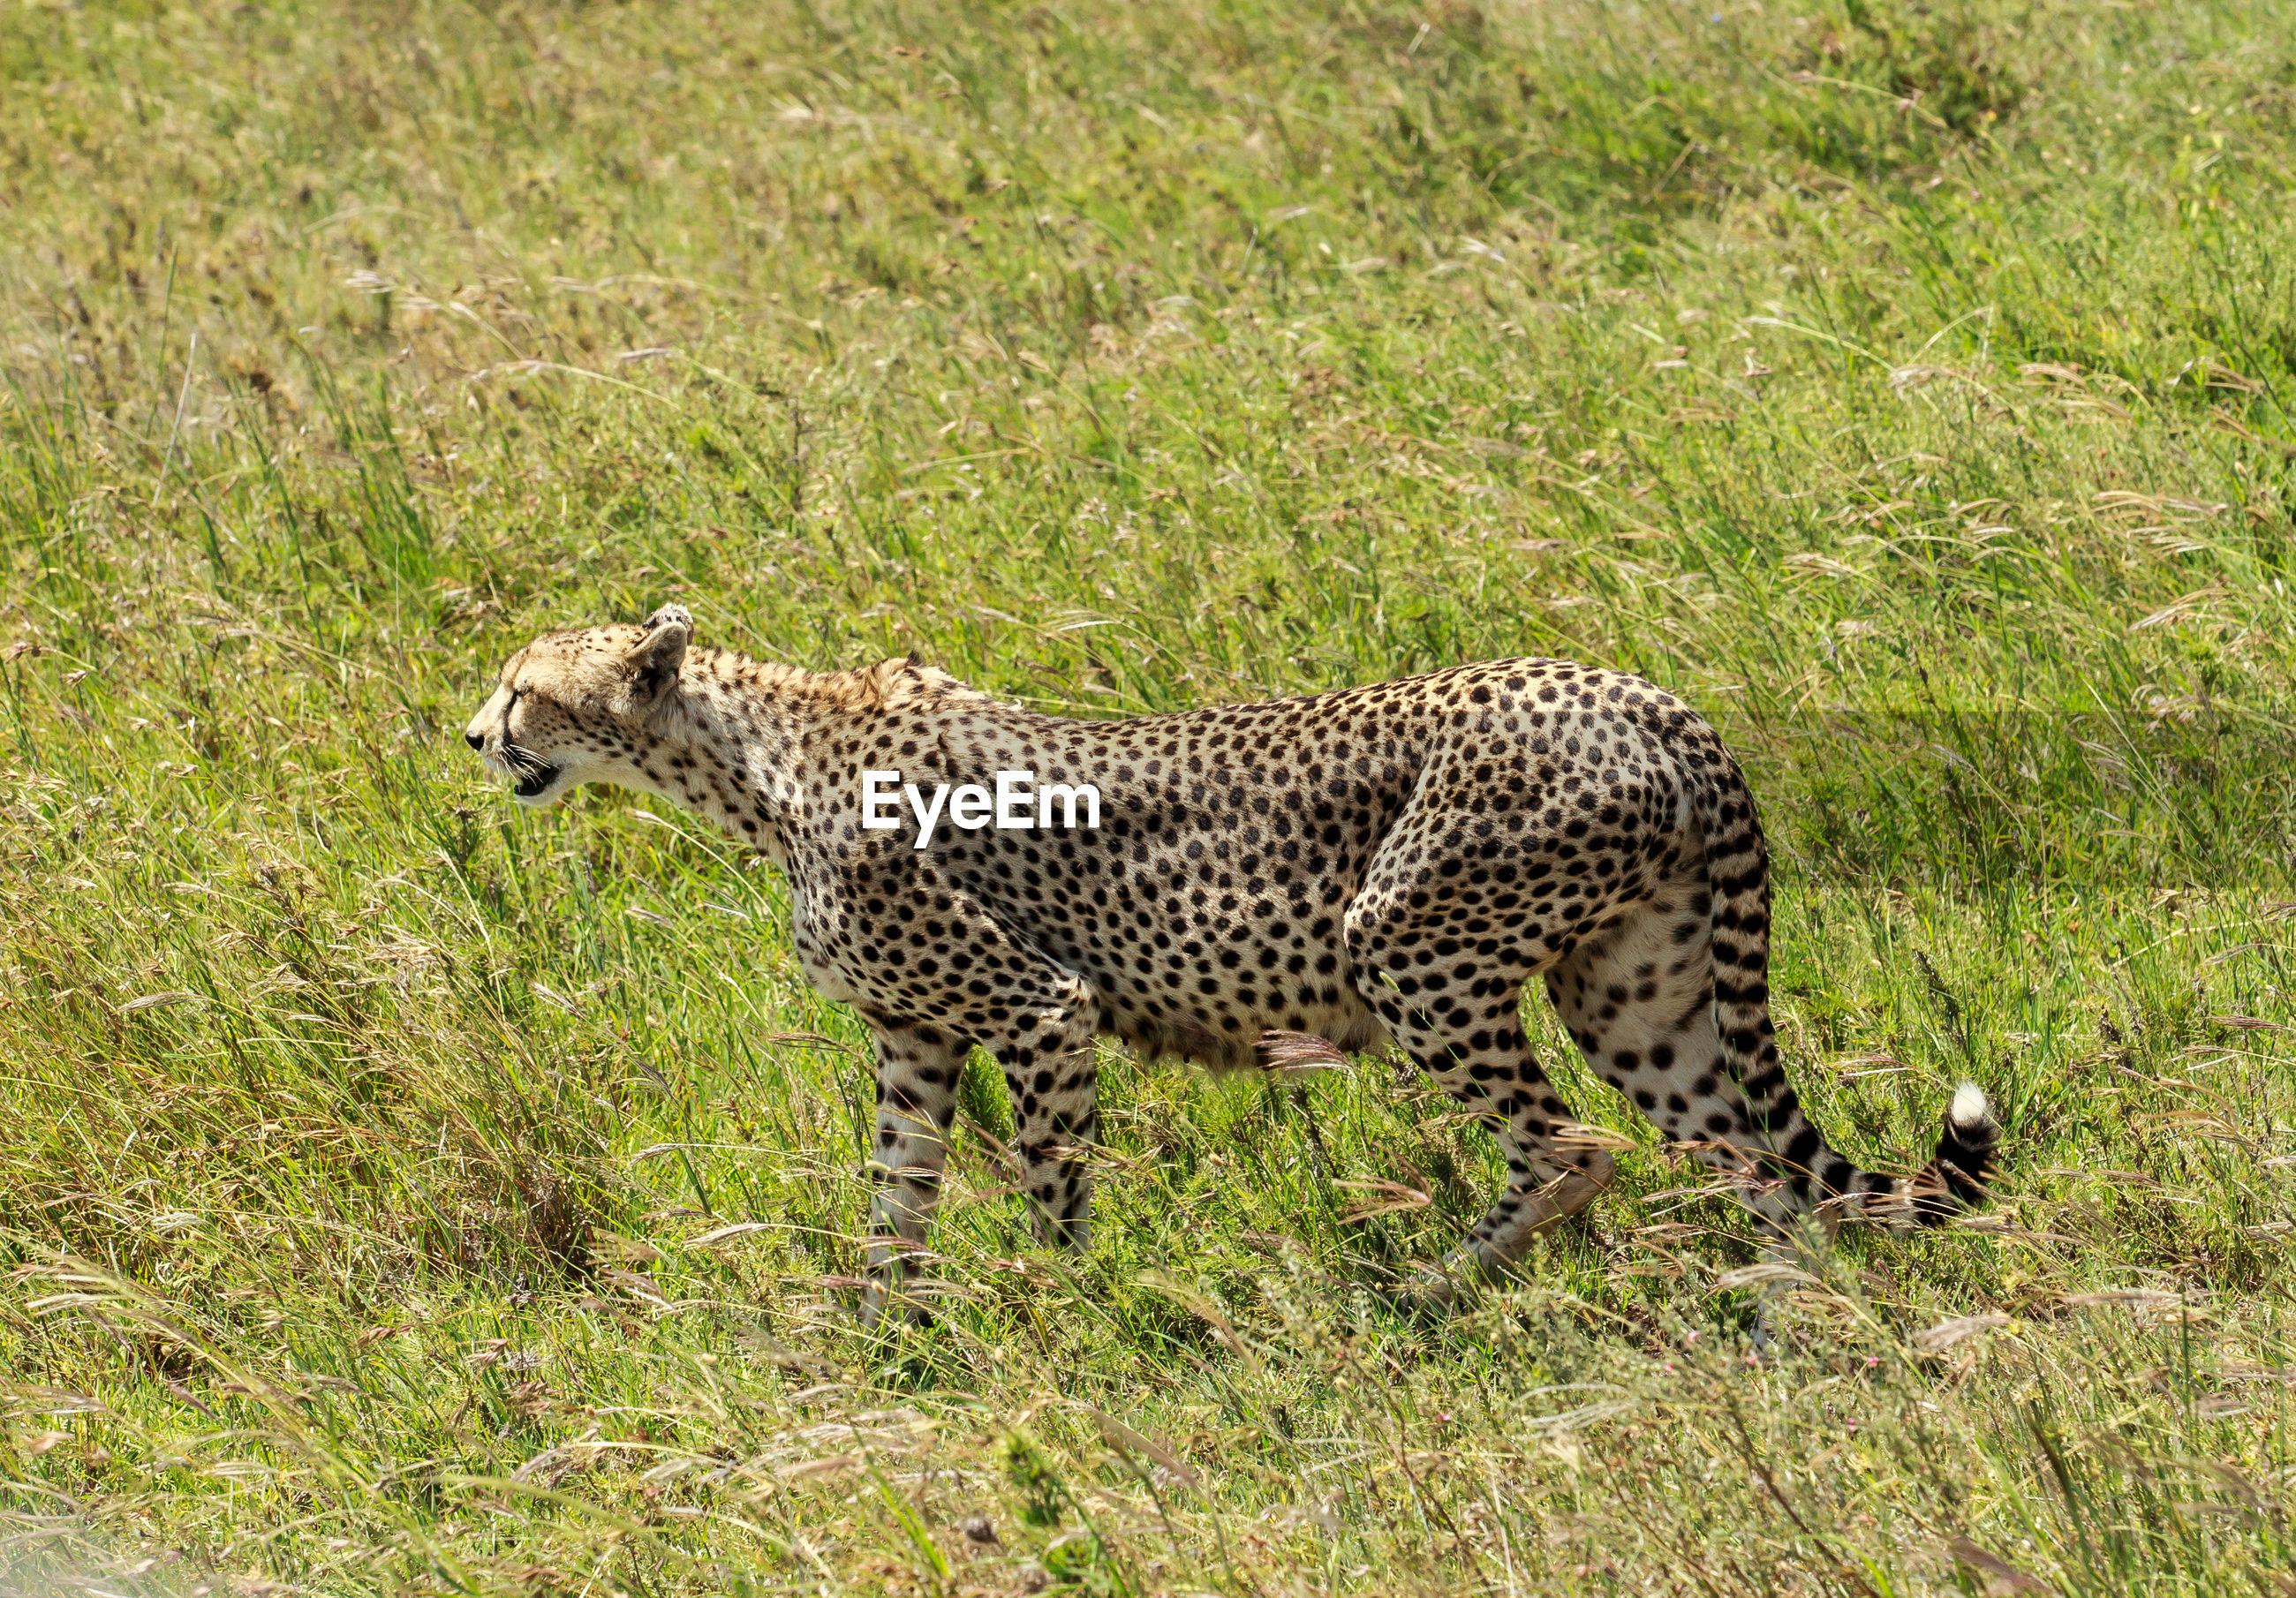 Cheetah walking on grass field